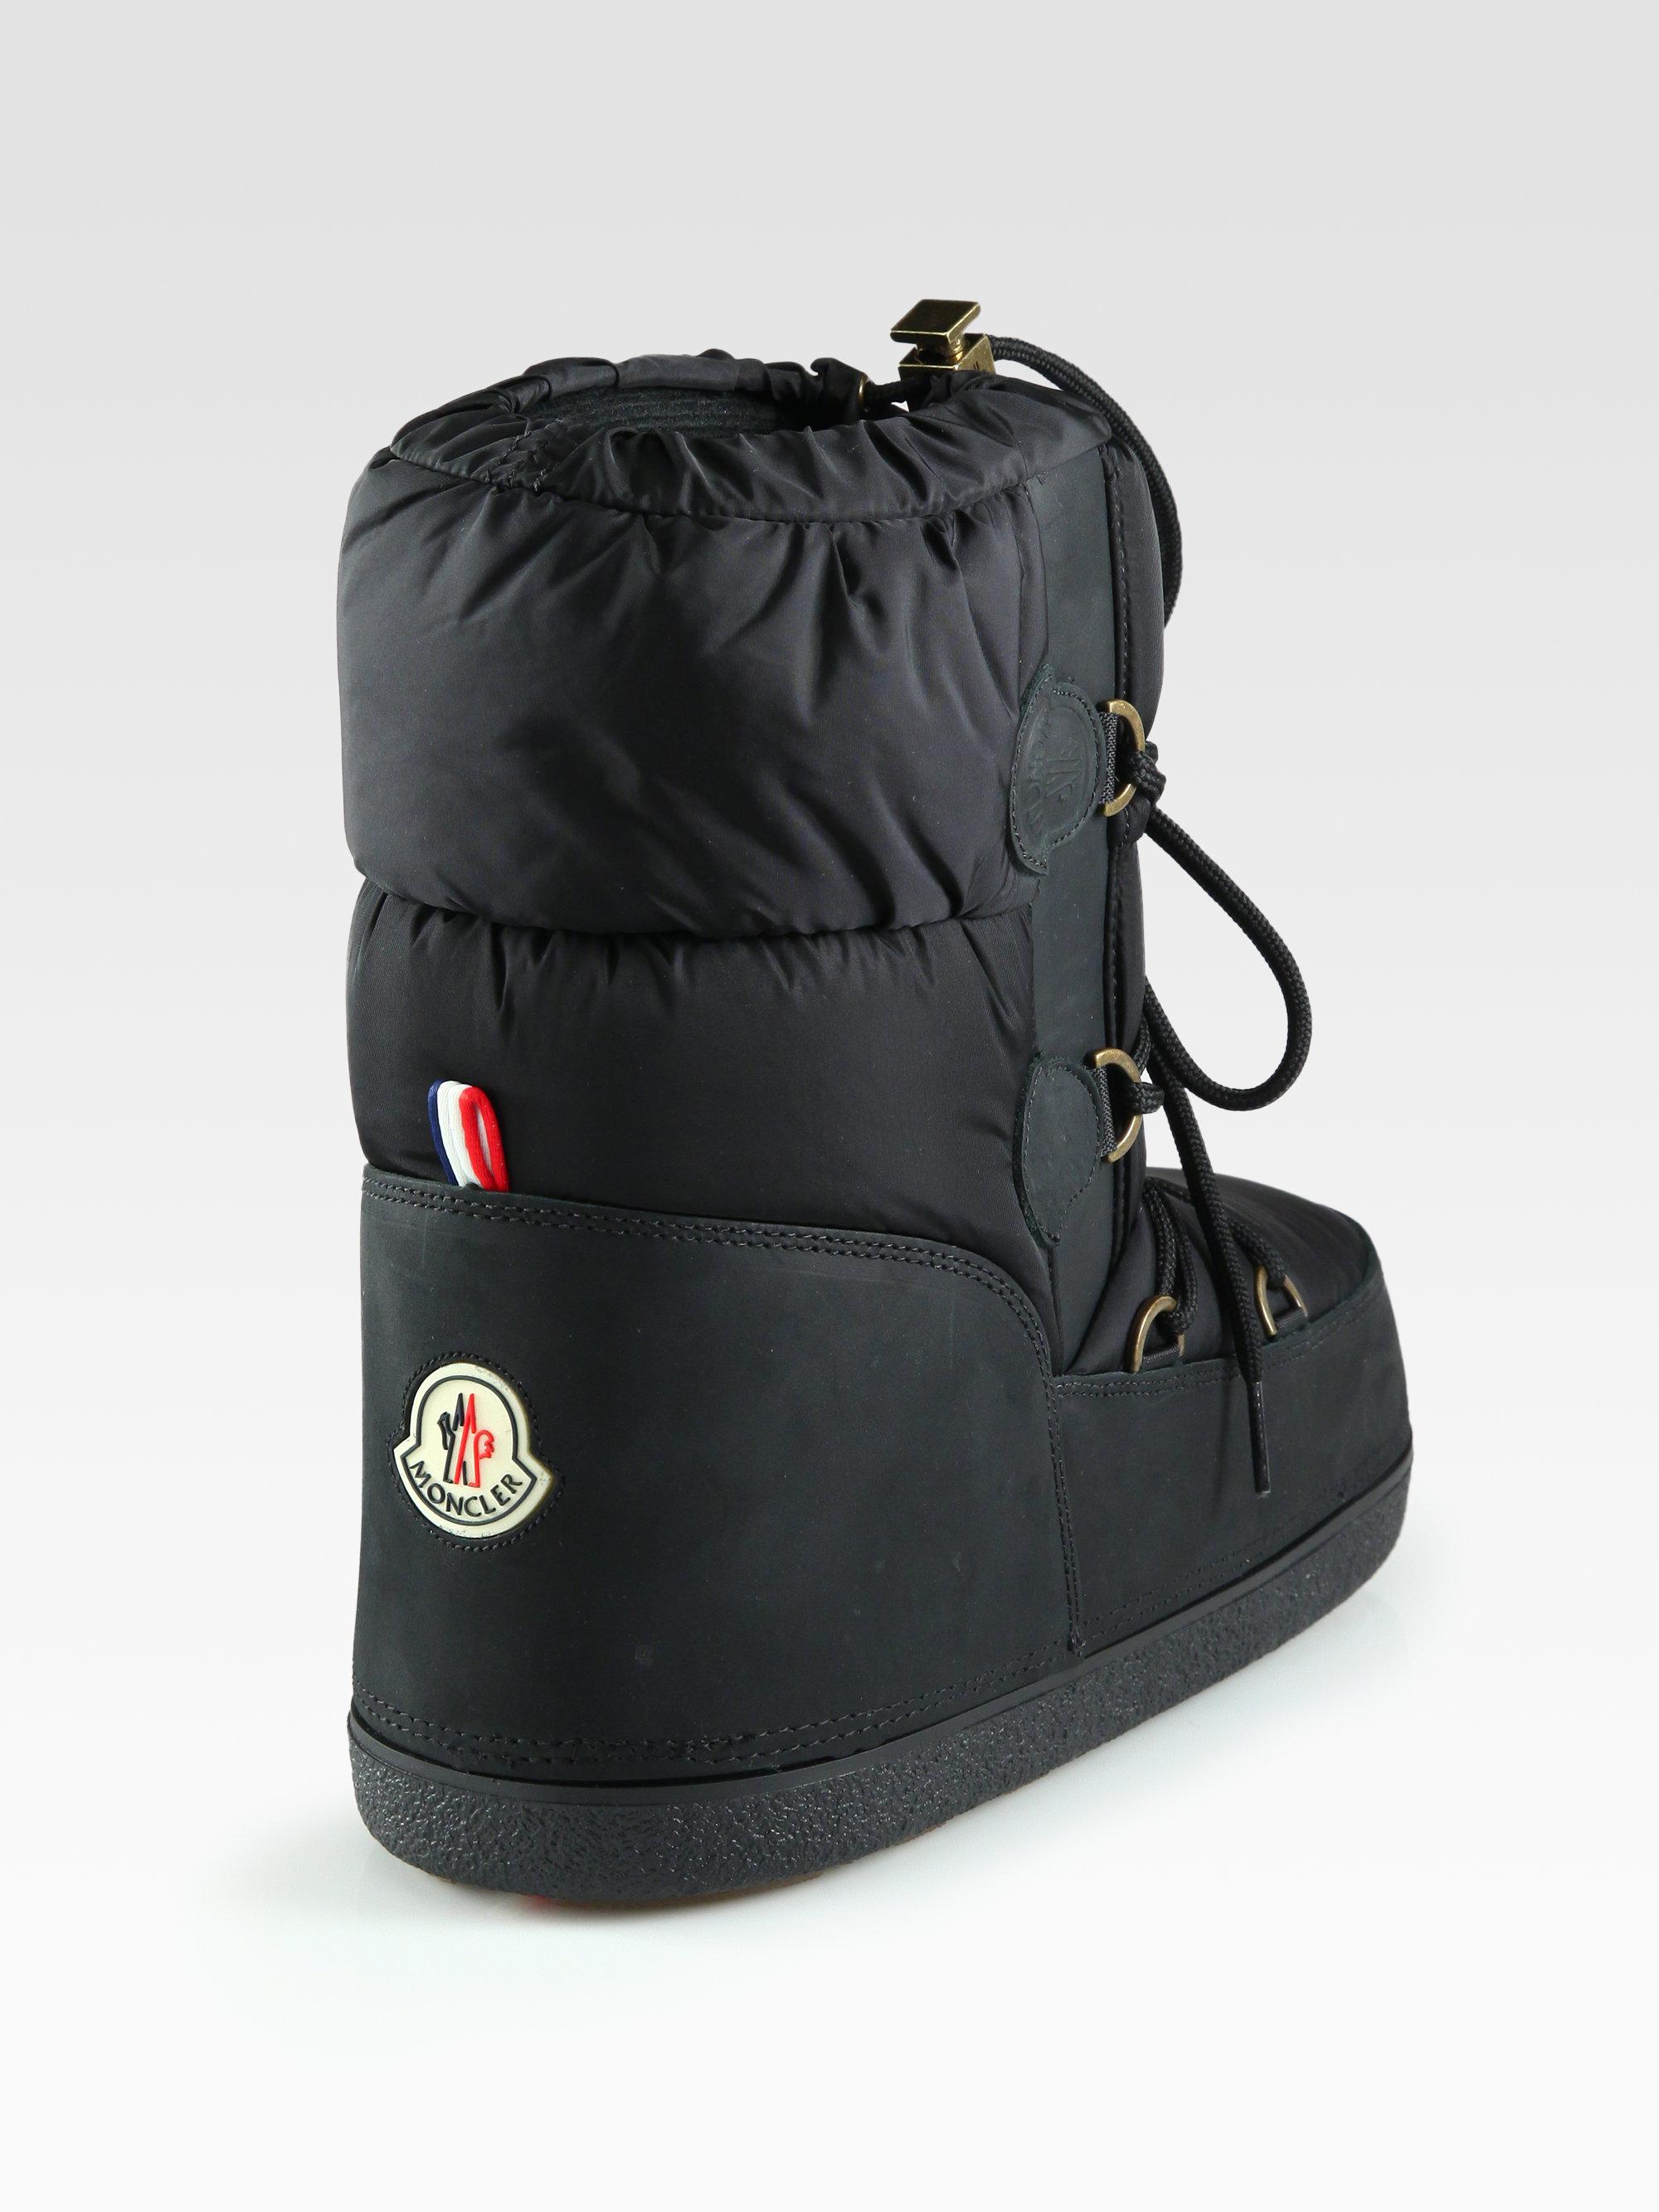 497e9d0e87b Moncler Black Nylon Leather Laceup Moon Boots